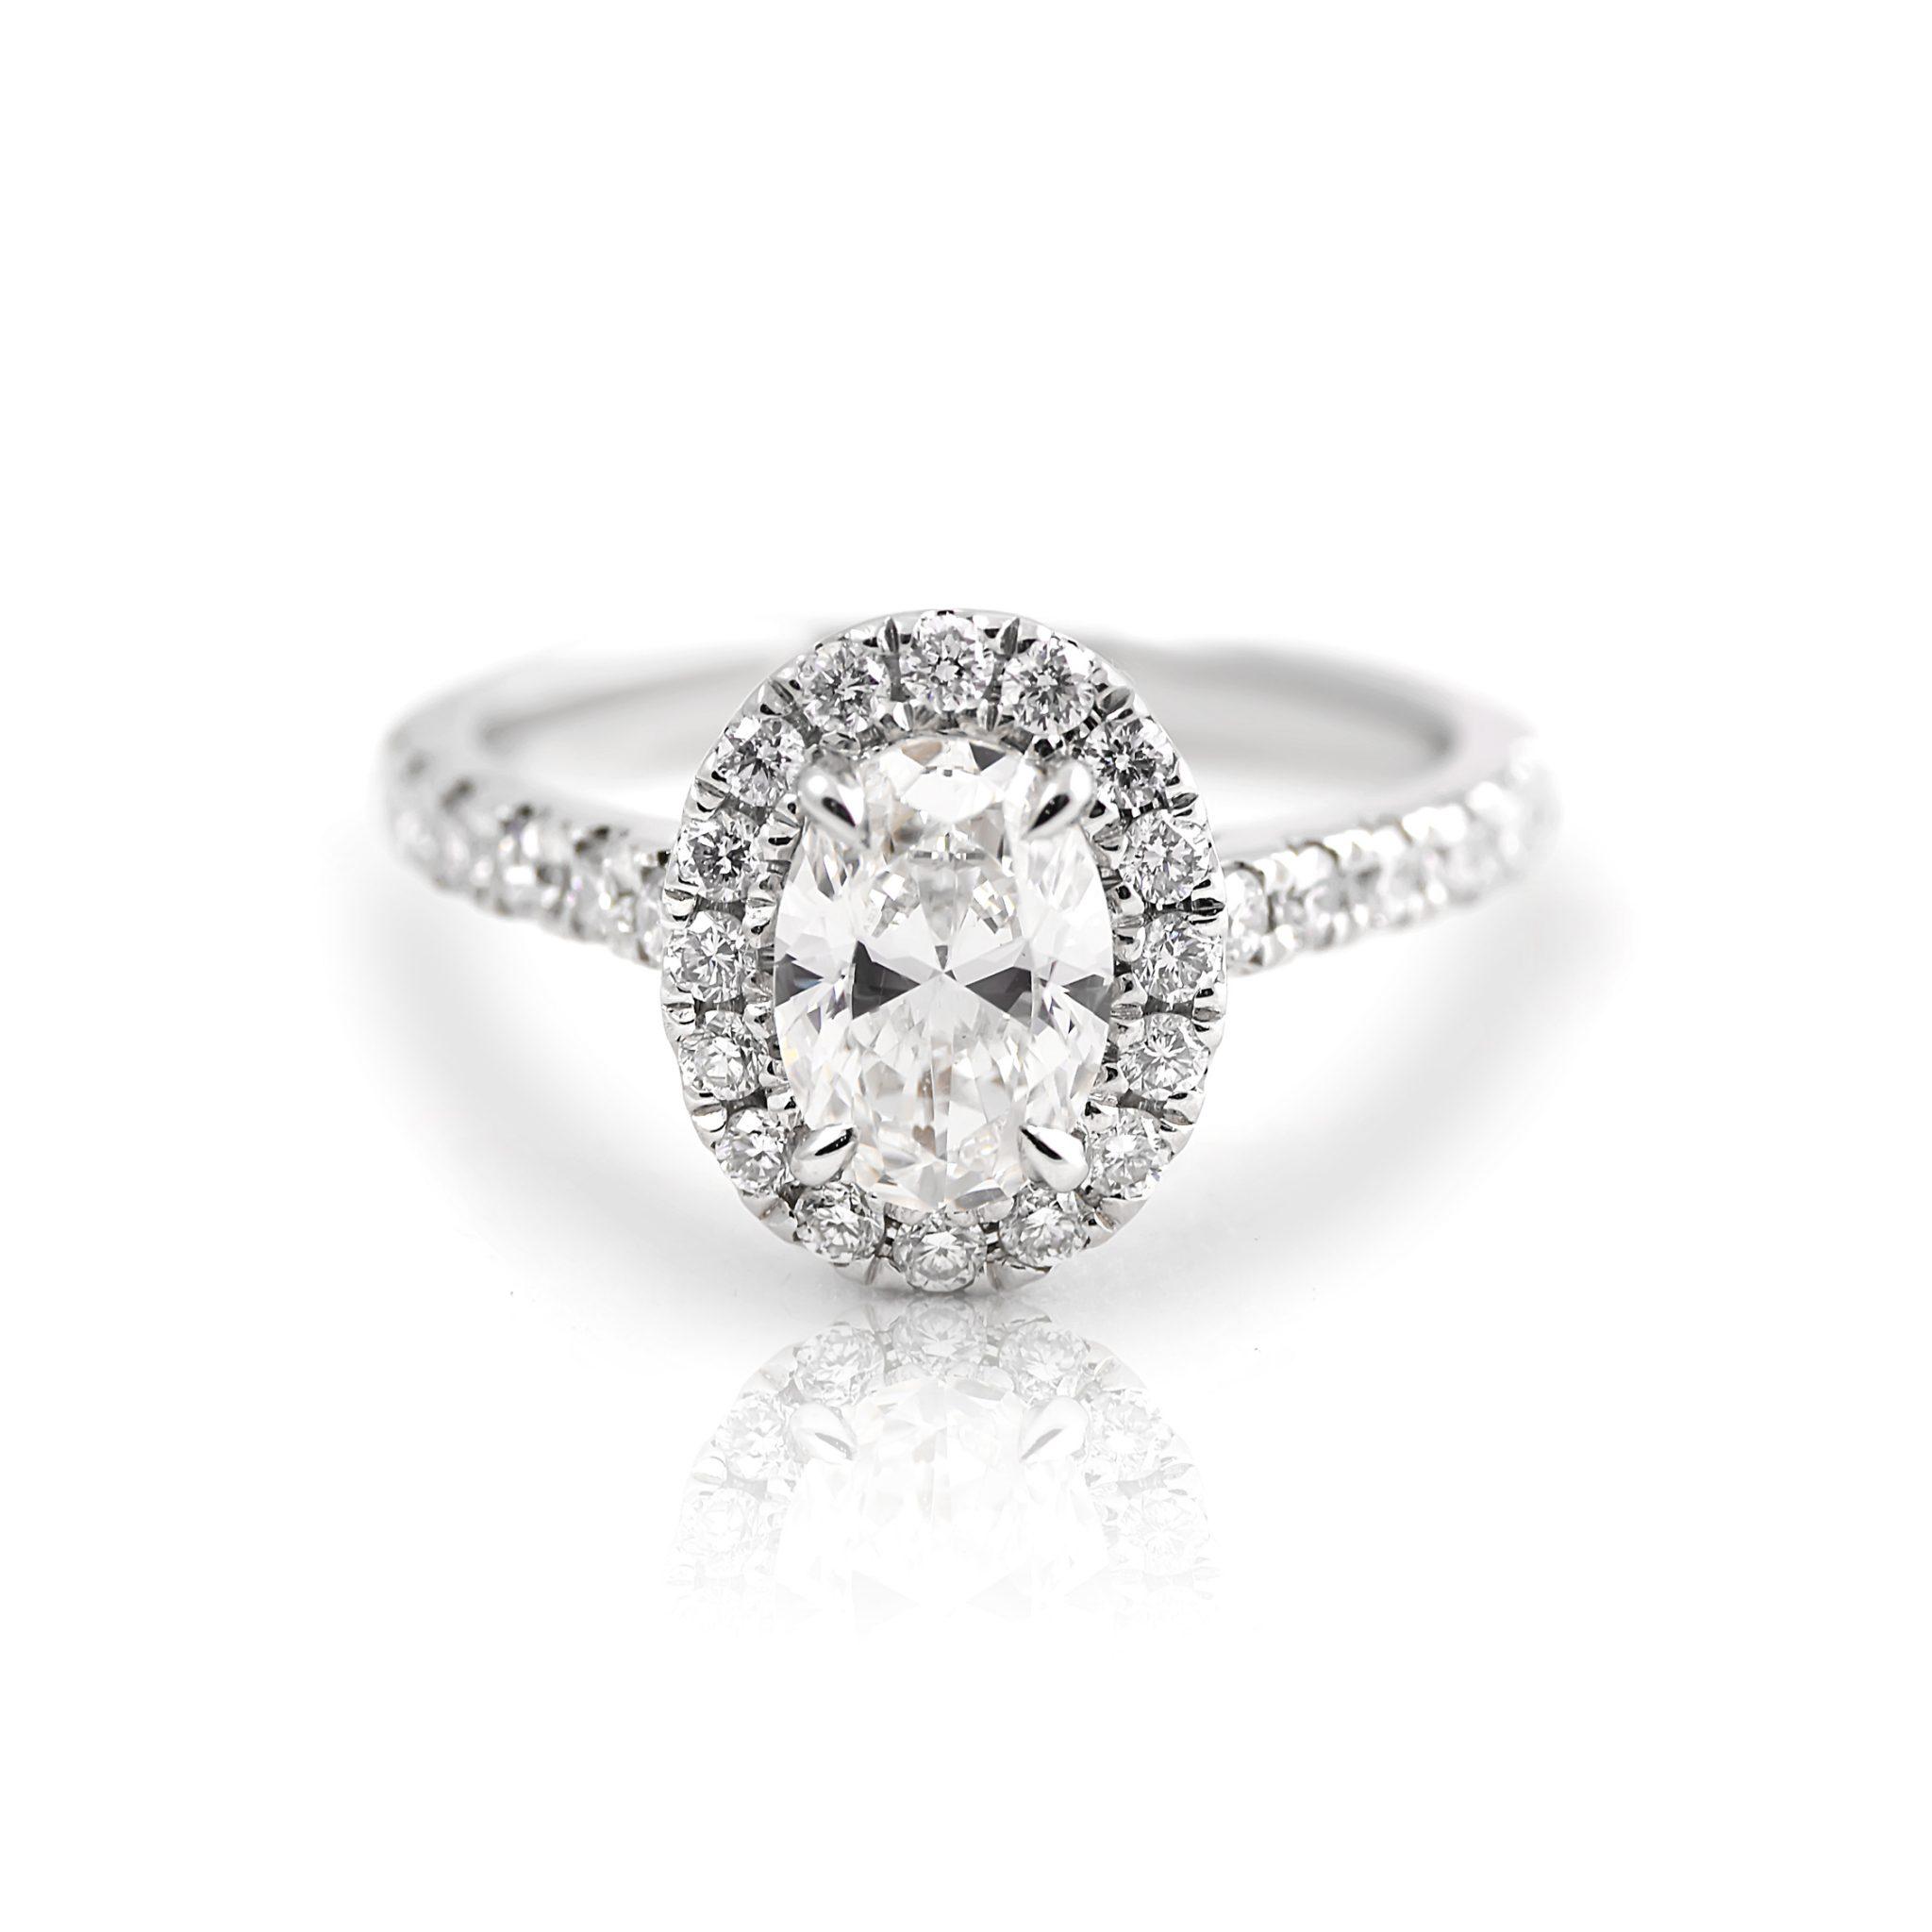 Oval Cut Diamond Halo Engagement Ring | B20981